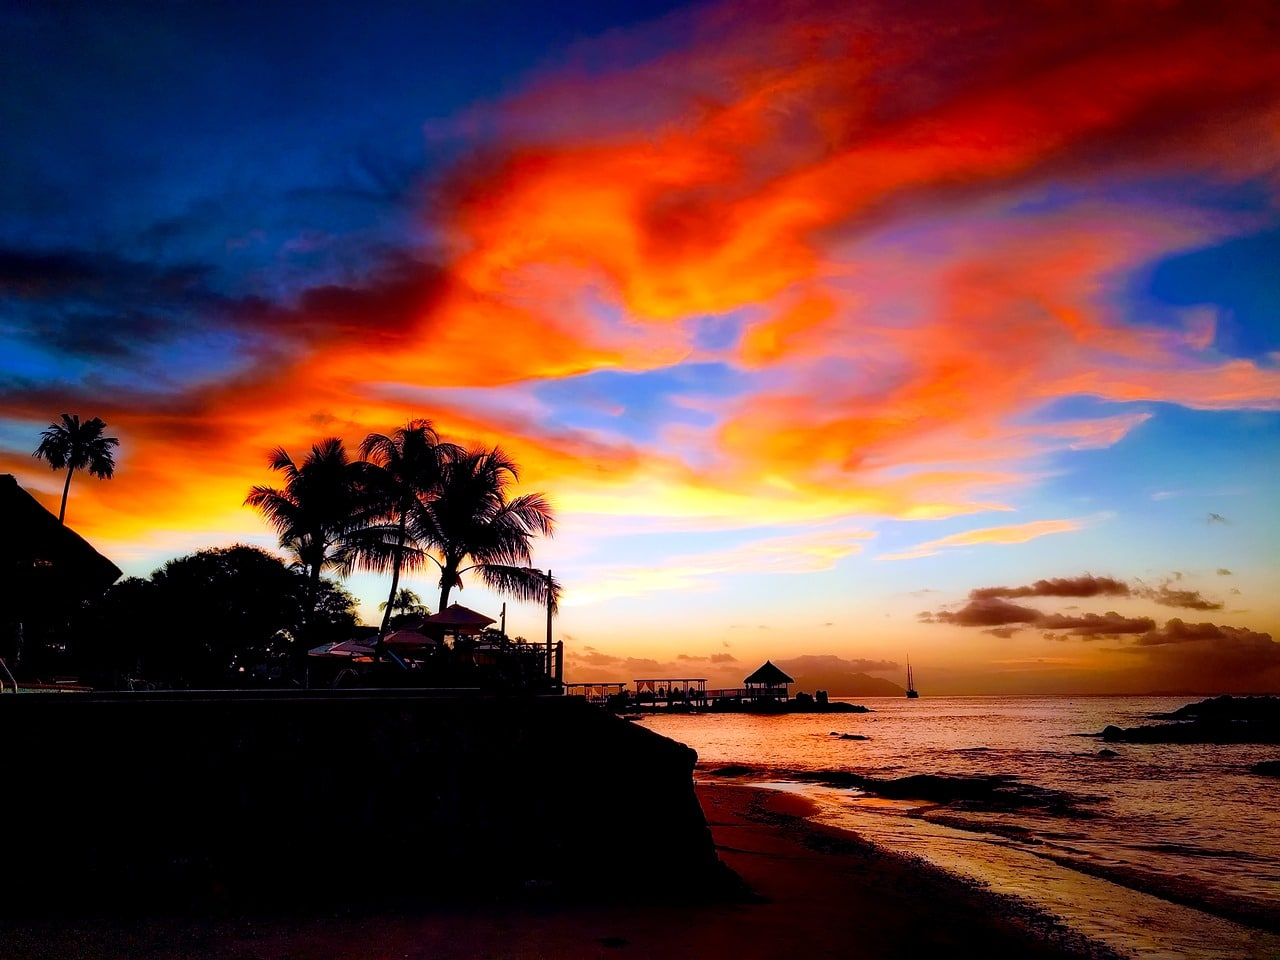 Yachtcharter Seychellen Strand Sonnenuntergang